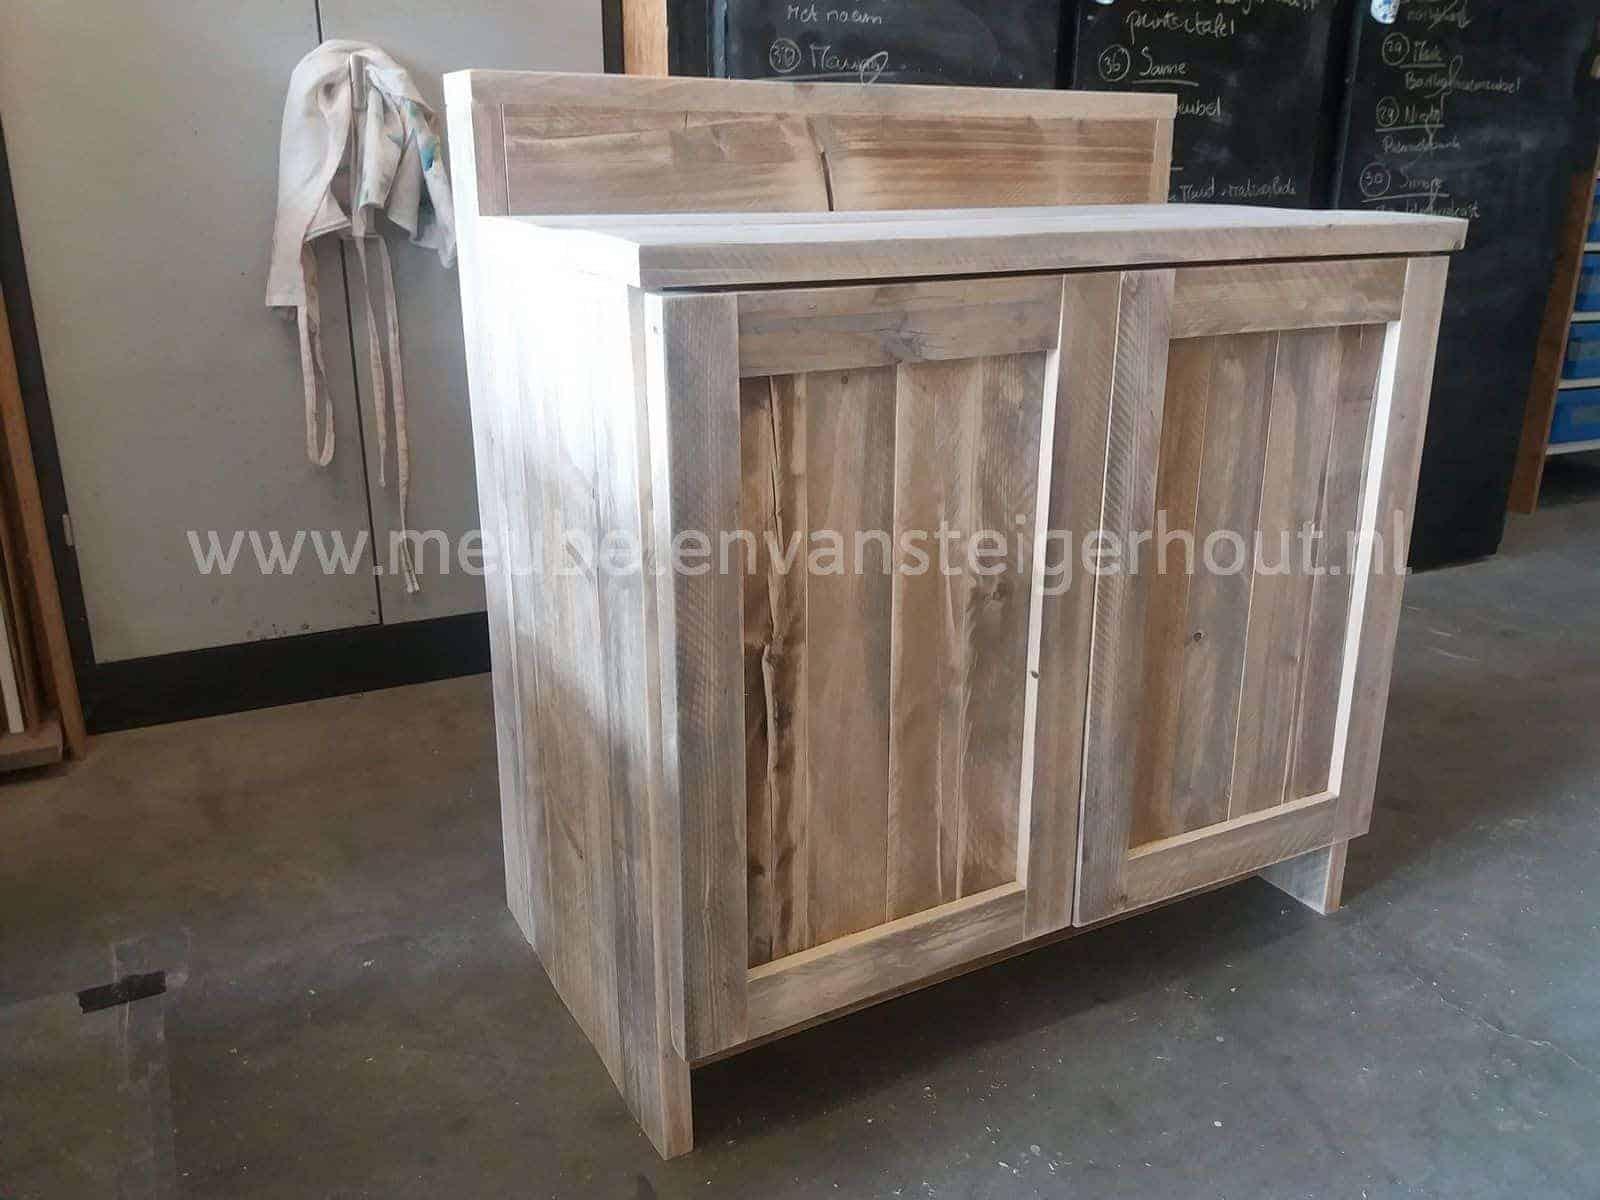 badkamermeubel steigerhout met verhoging meubelen van steigerhout